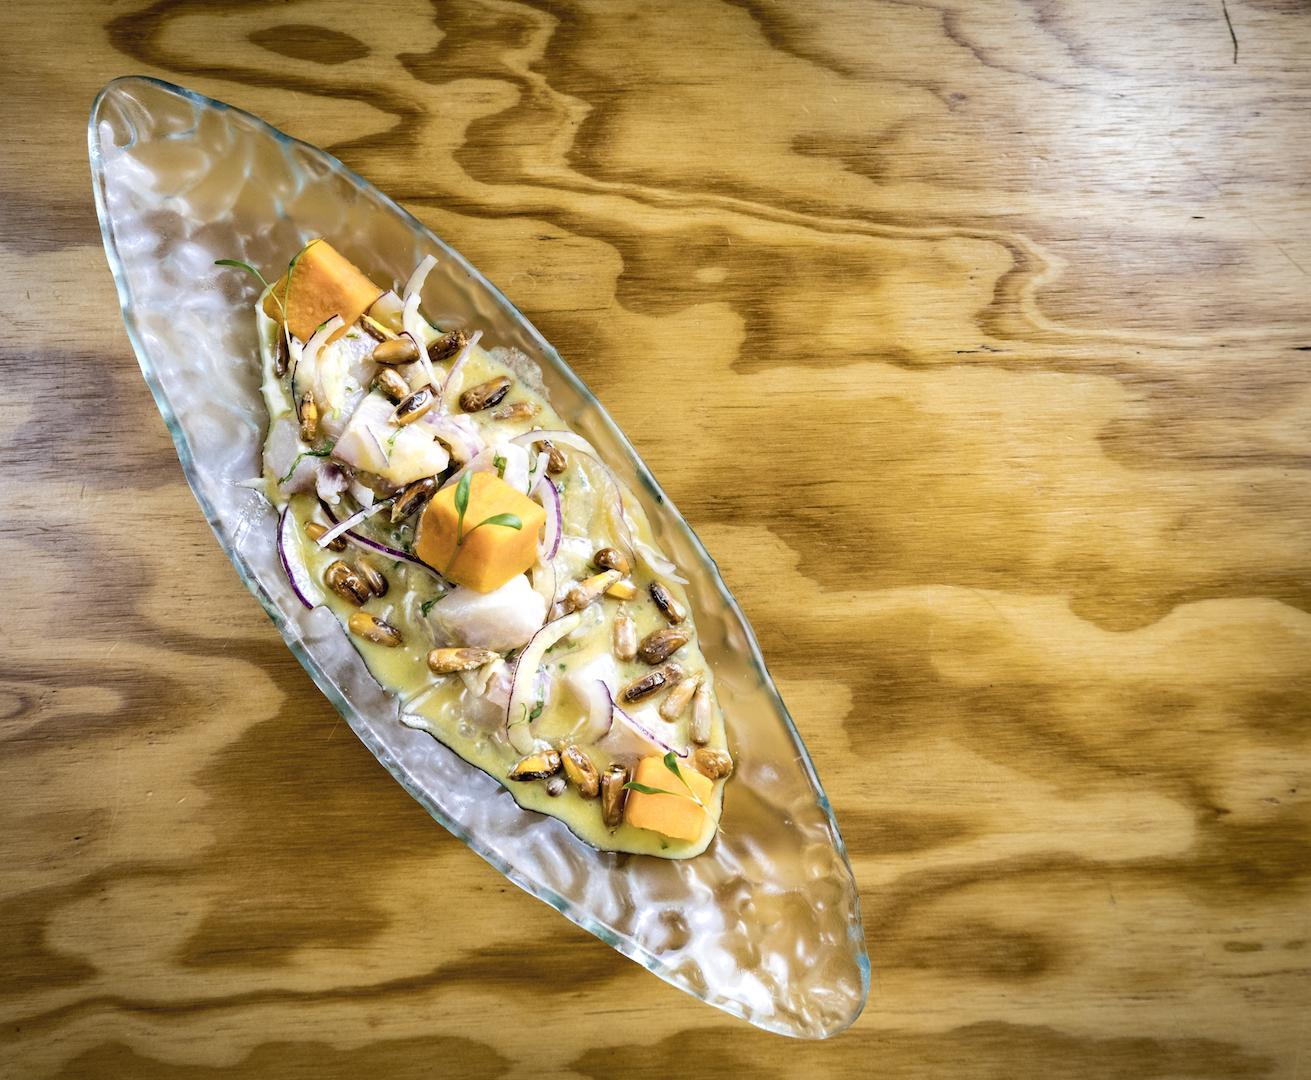 Ceviche |Chicha | TookTook